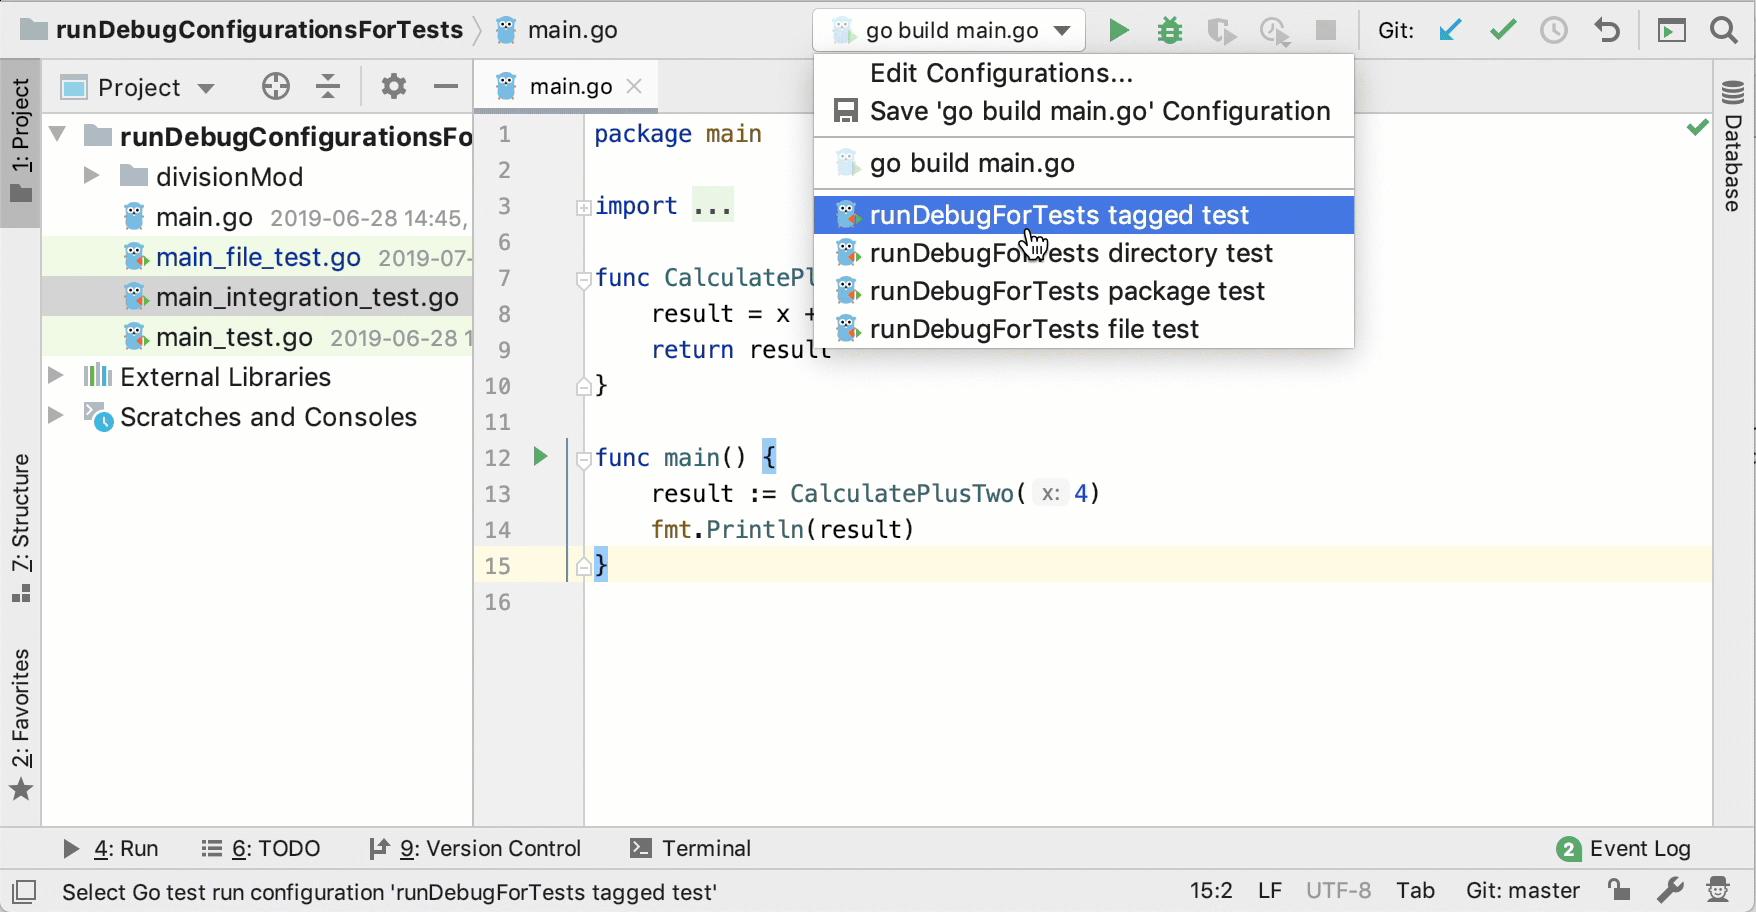 Run a run/debug configuration for tests